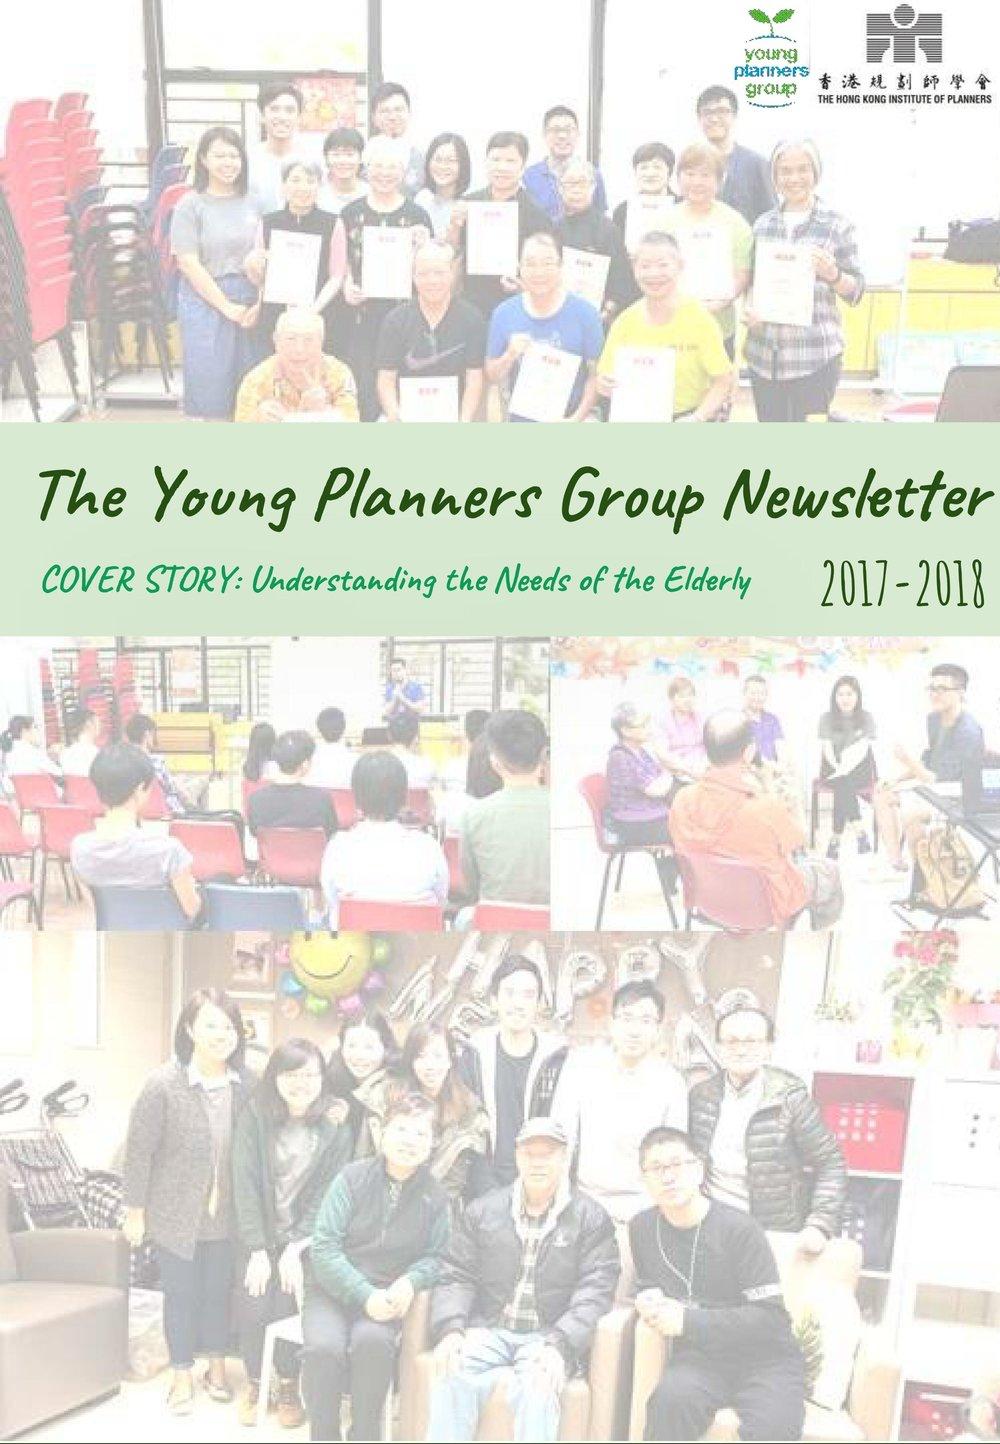 YPG Newsletter (PDF file)  YPG Newsletter 2017-2018.pdf